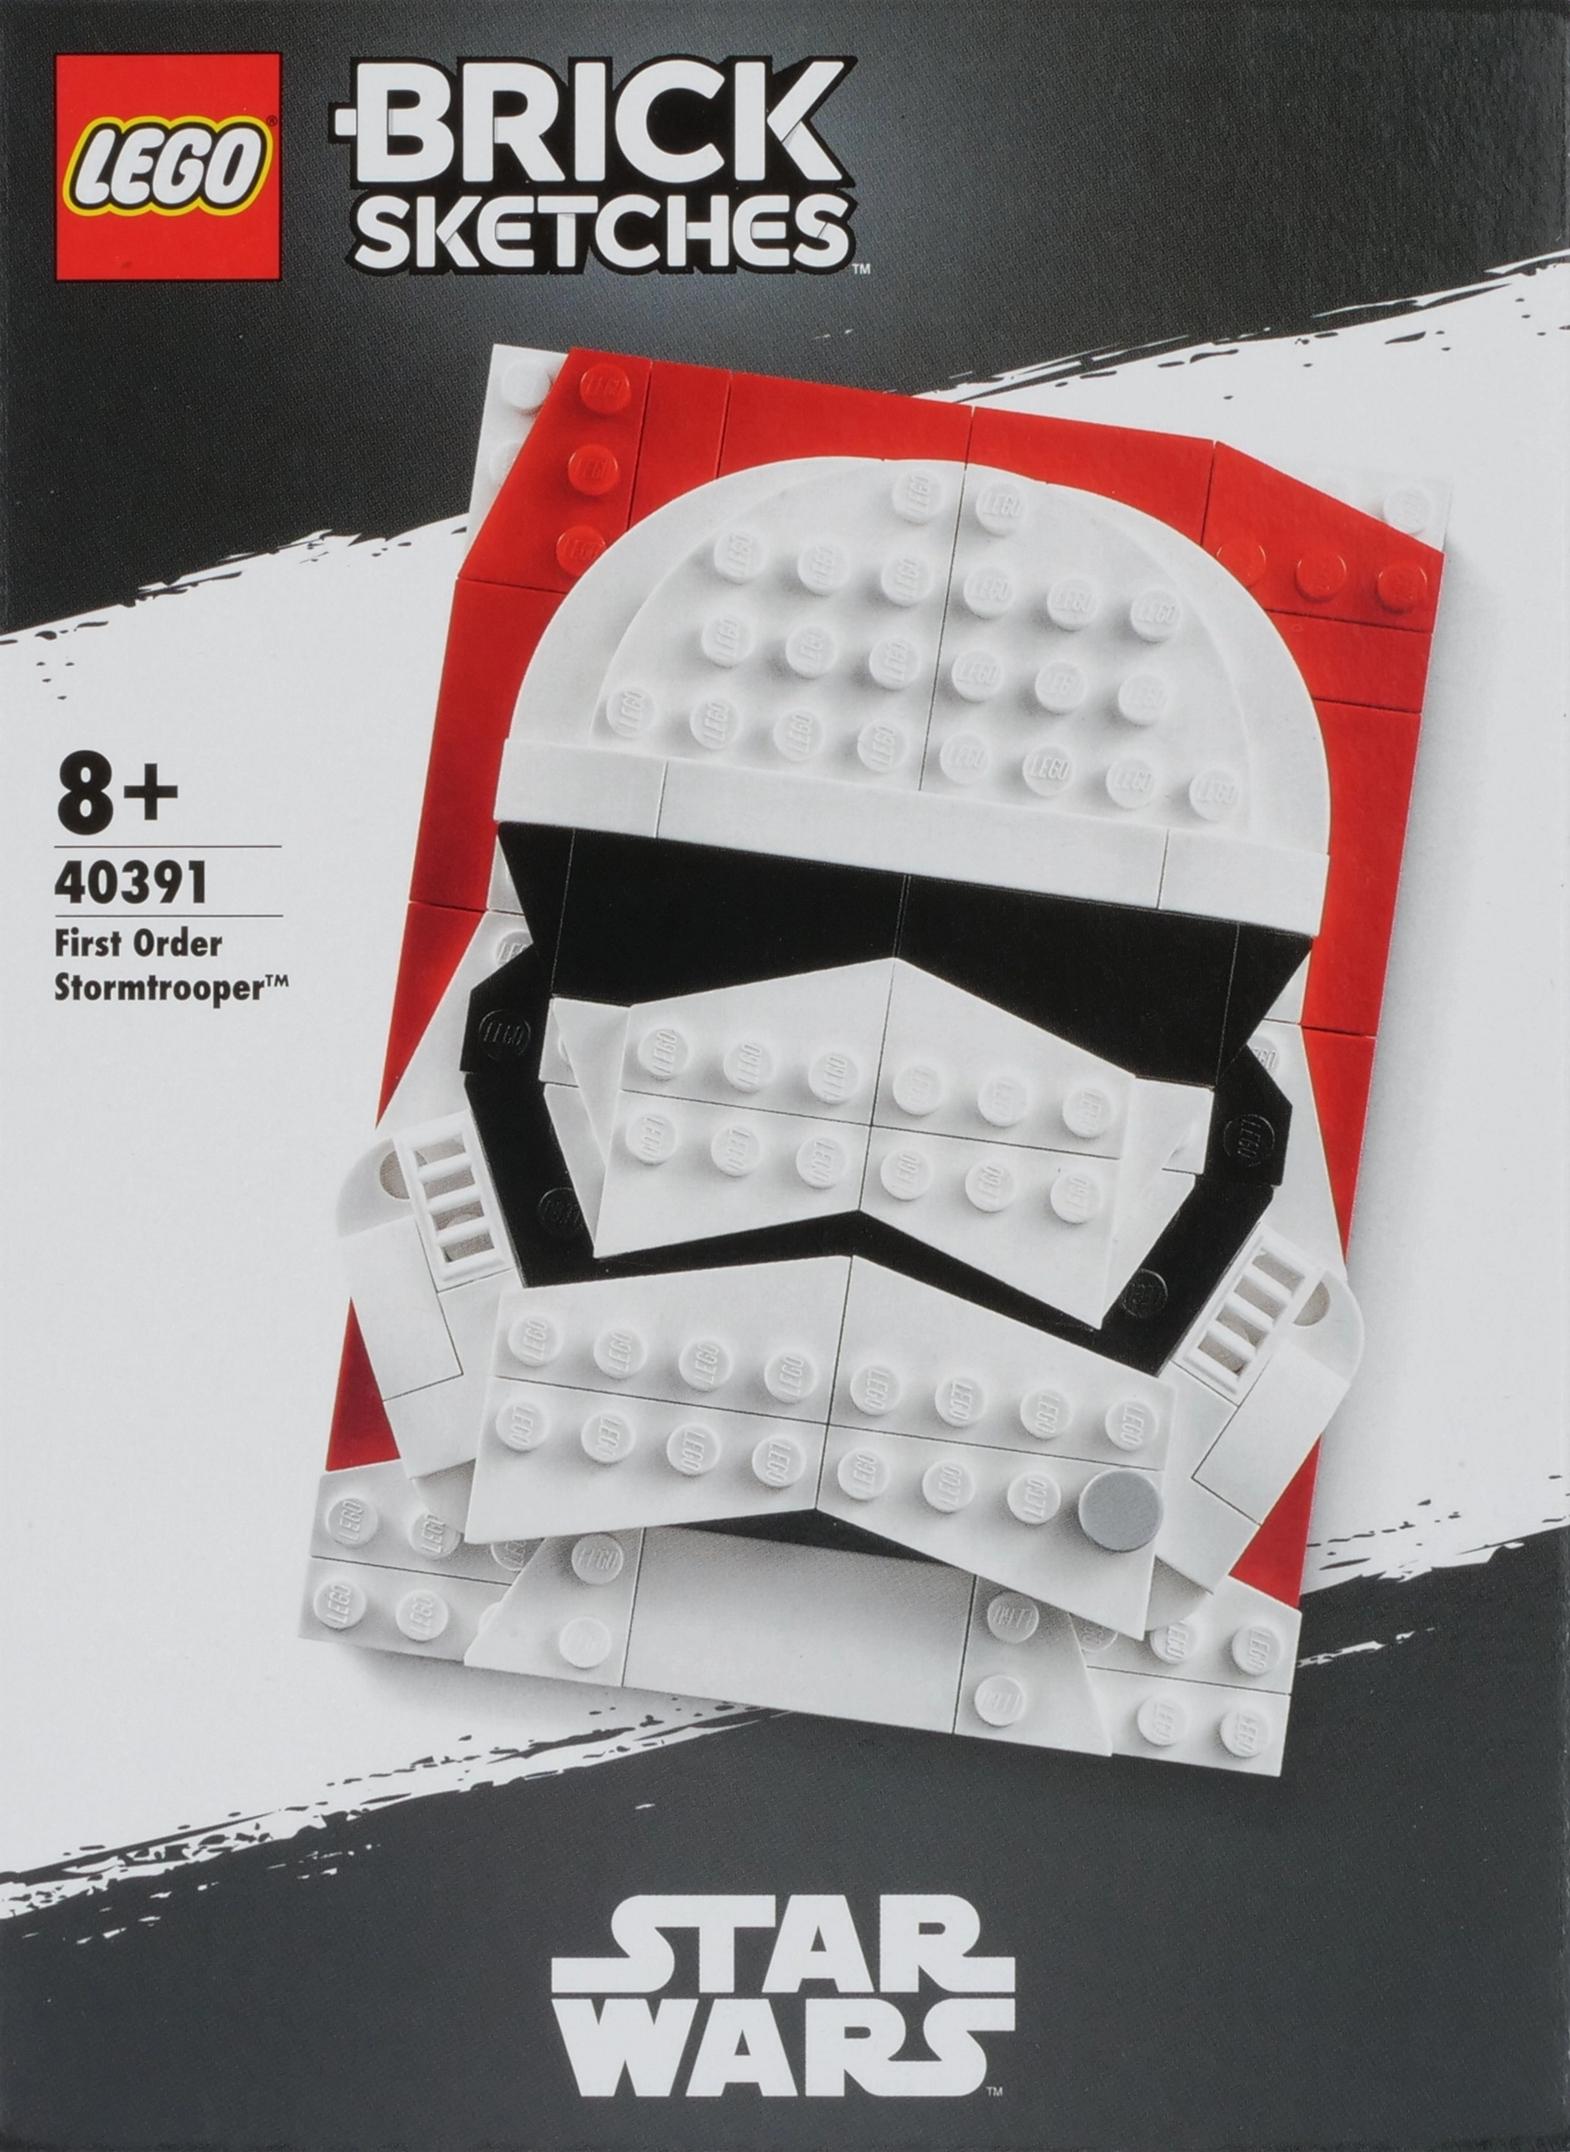 lego-brick-sketches-first-order-stormtrooper.jpg